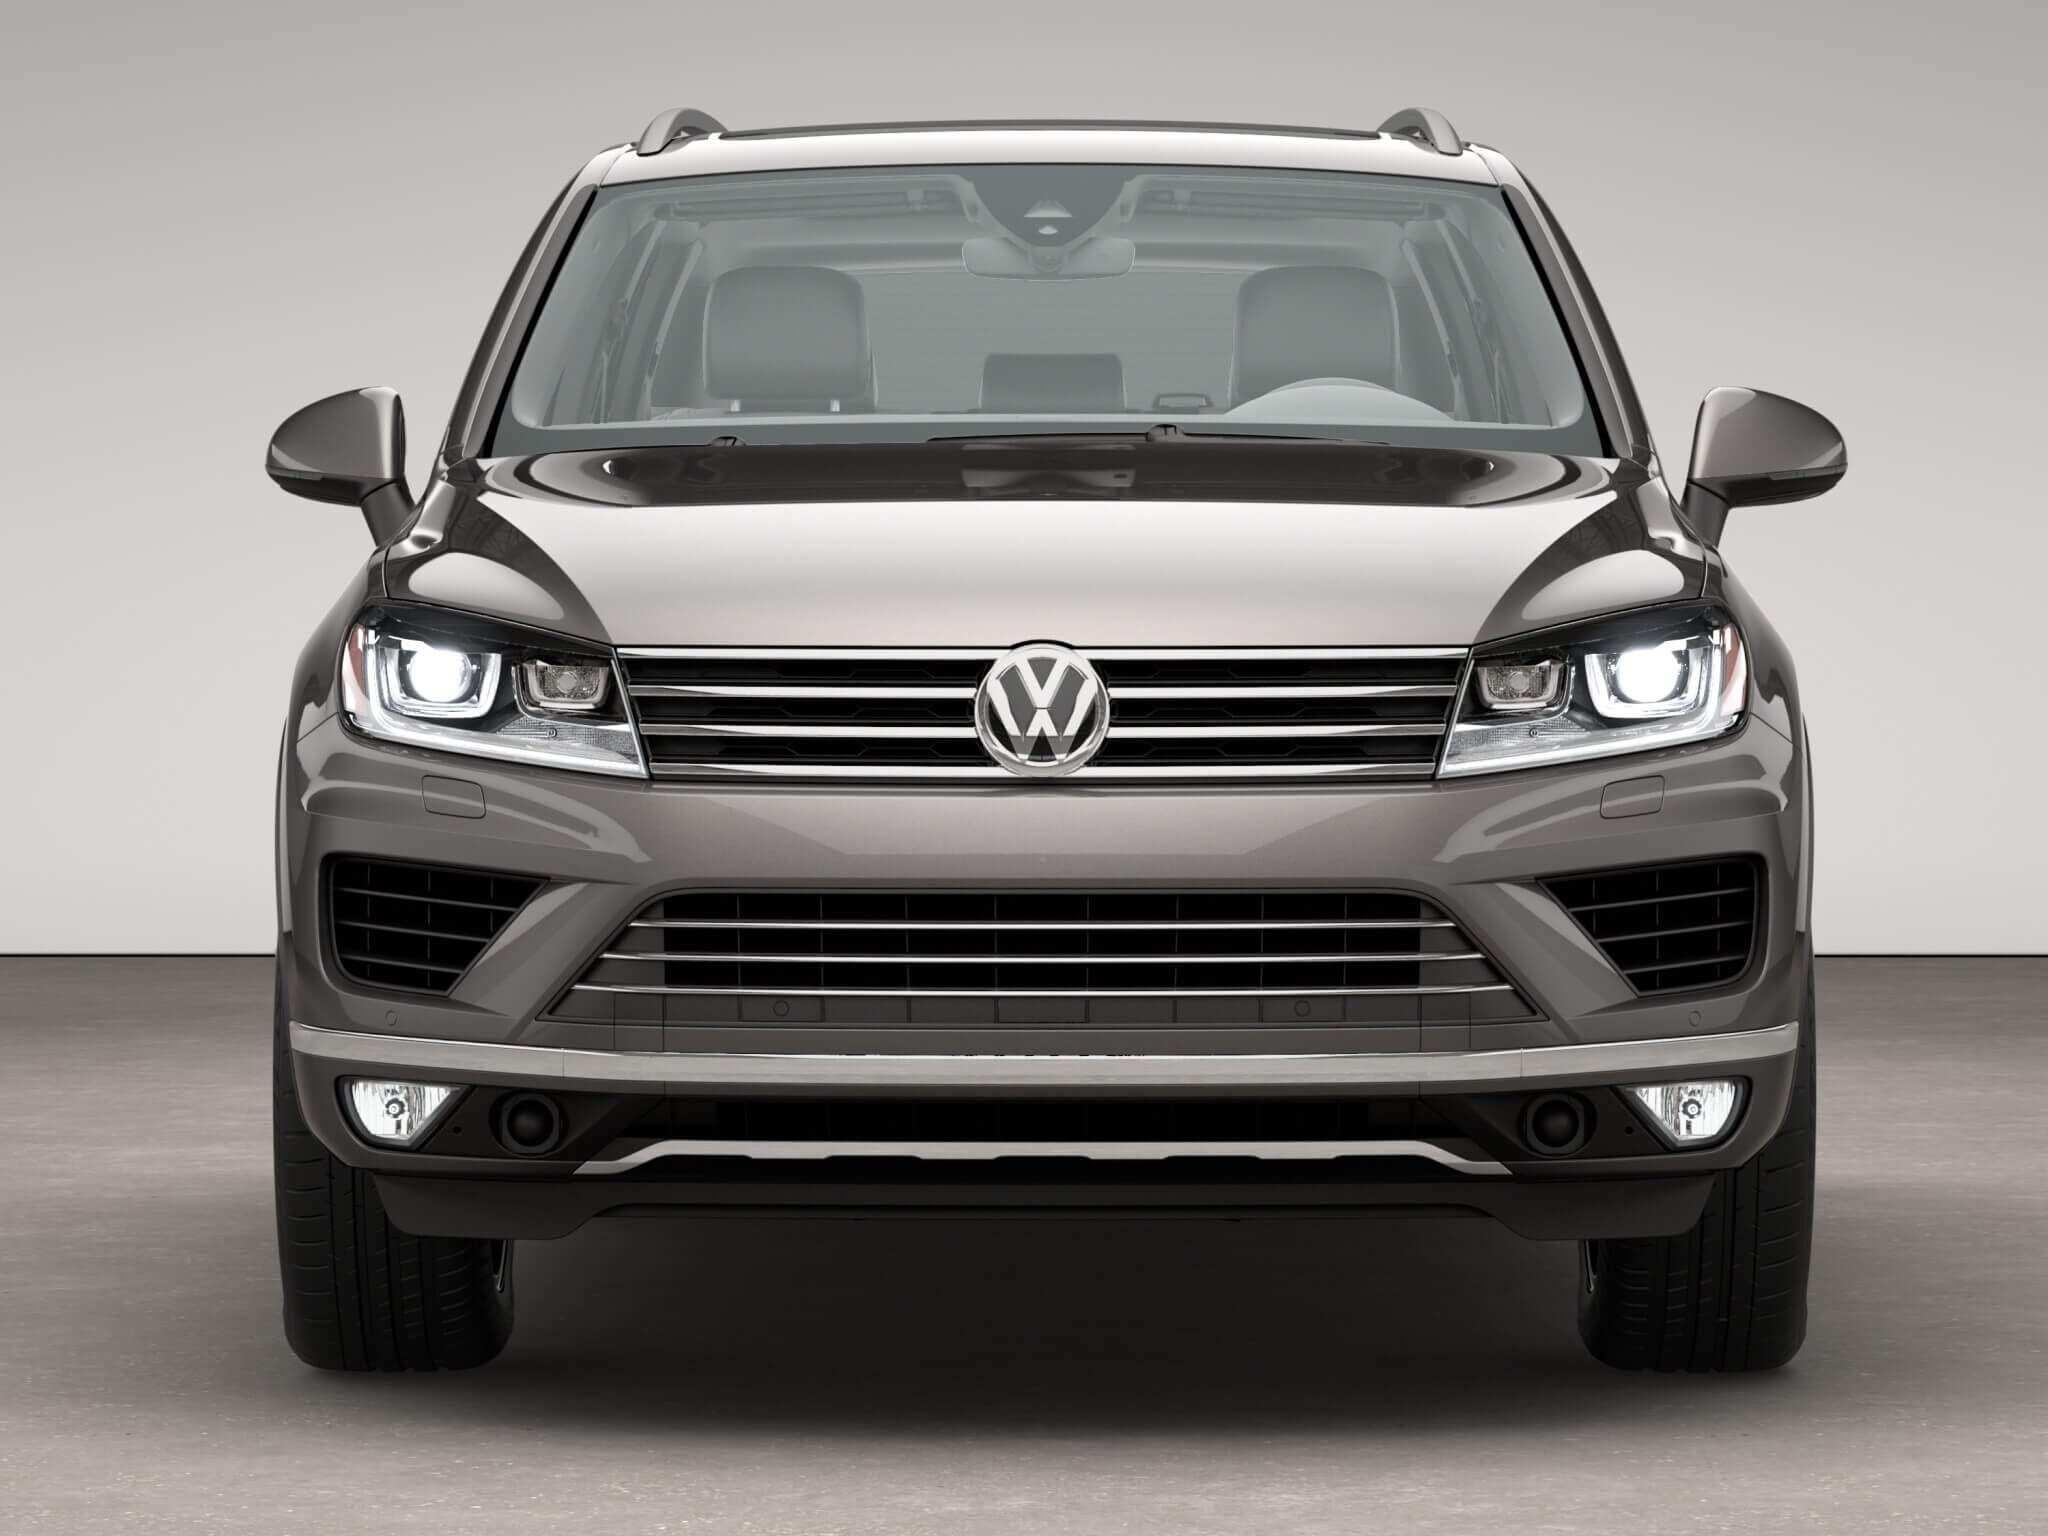 29 All New New Volkswagen Touareg 2020 Photos for New Volkswagen Touareg 2020